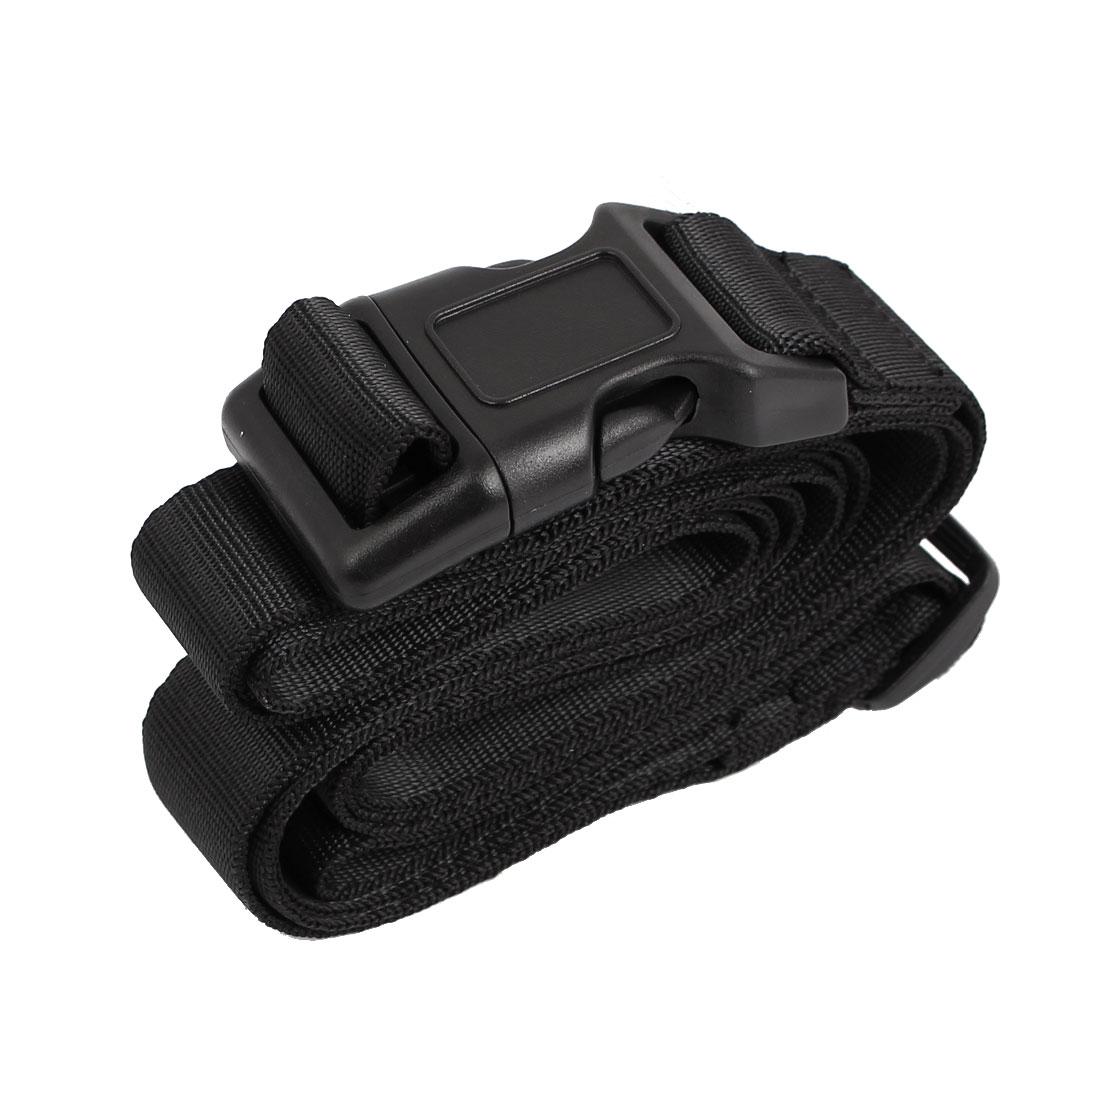 Quick Release Buckle Luggage Suitcase Backpack Baggage Adjustable Belt Strap Black 2M x 25mm